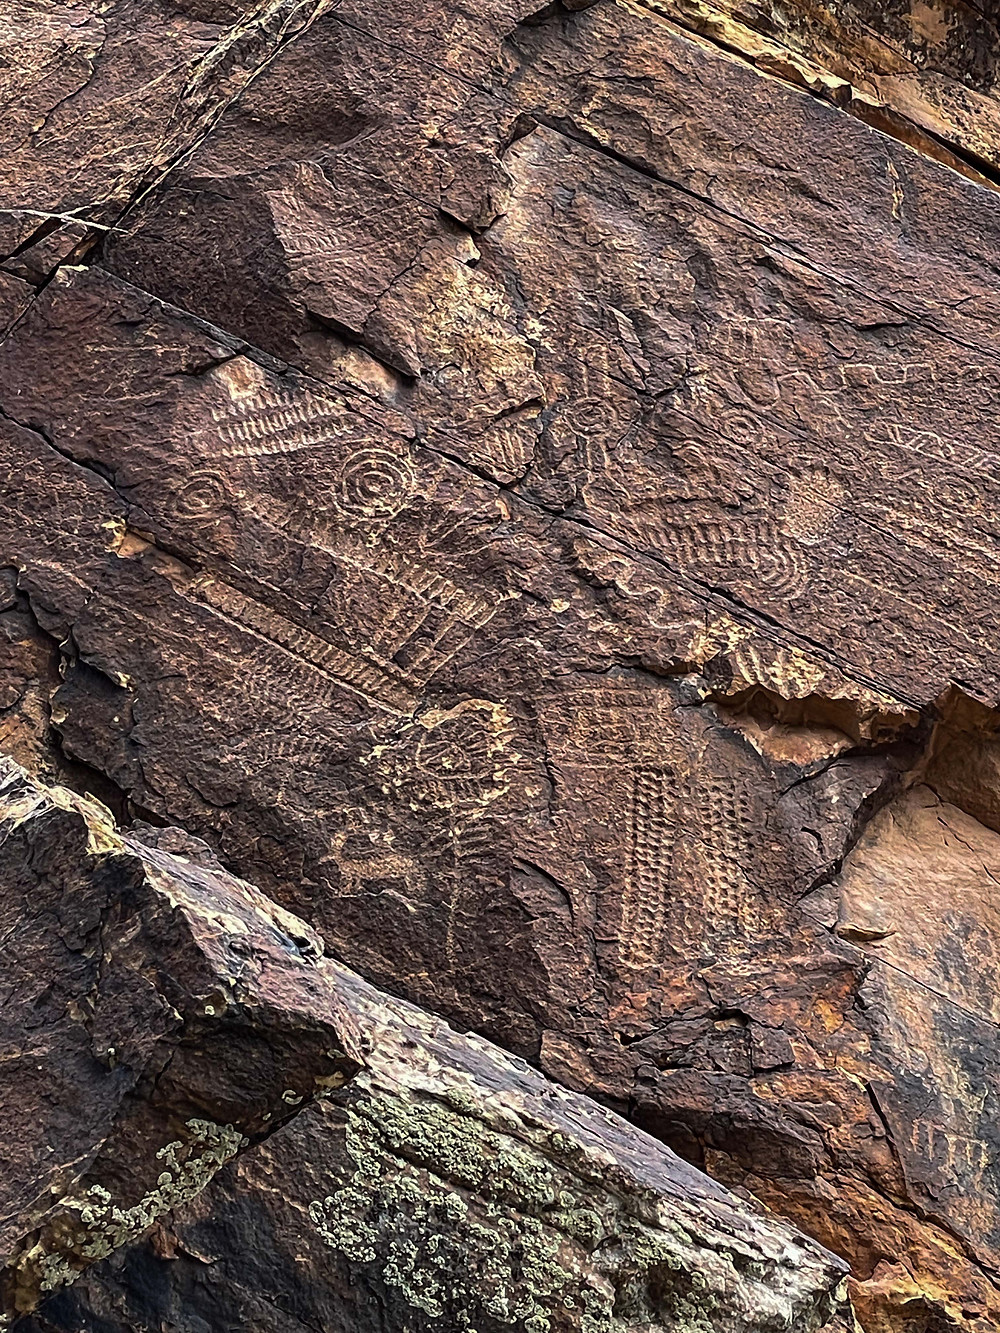 Ancient Petroglyphs at the Parowan Gap, near Parowan Utah